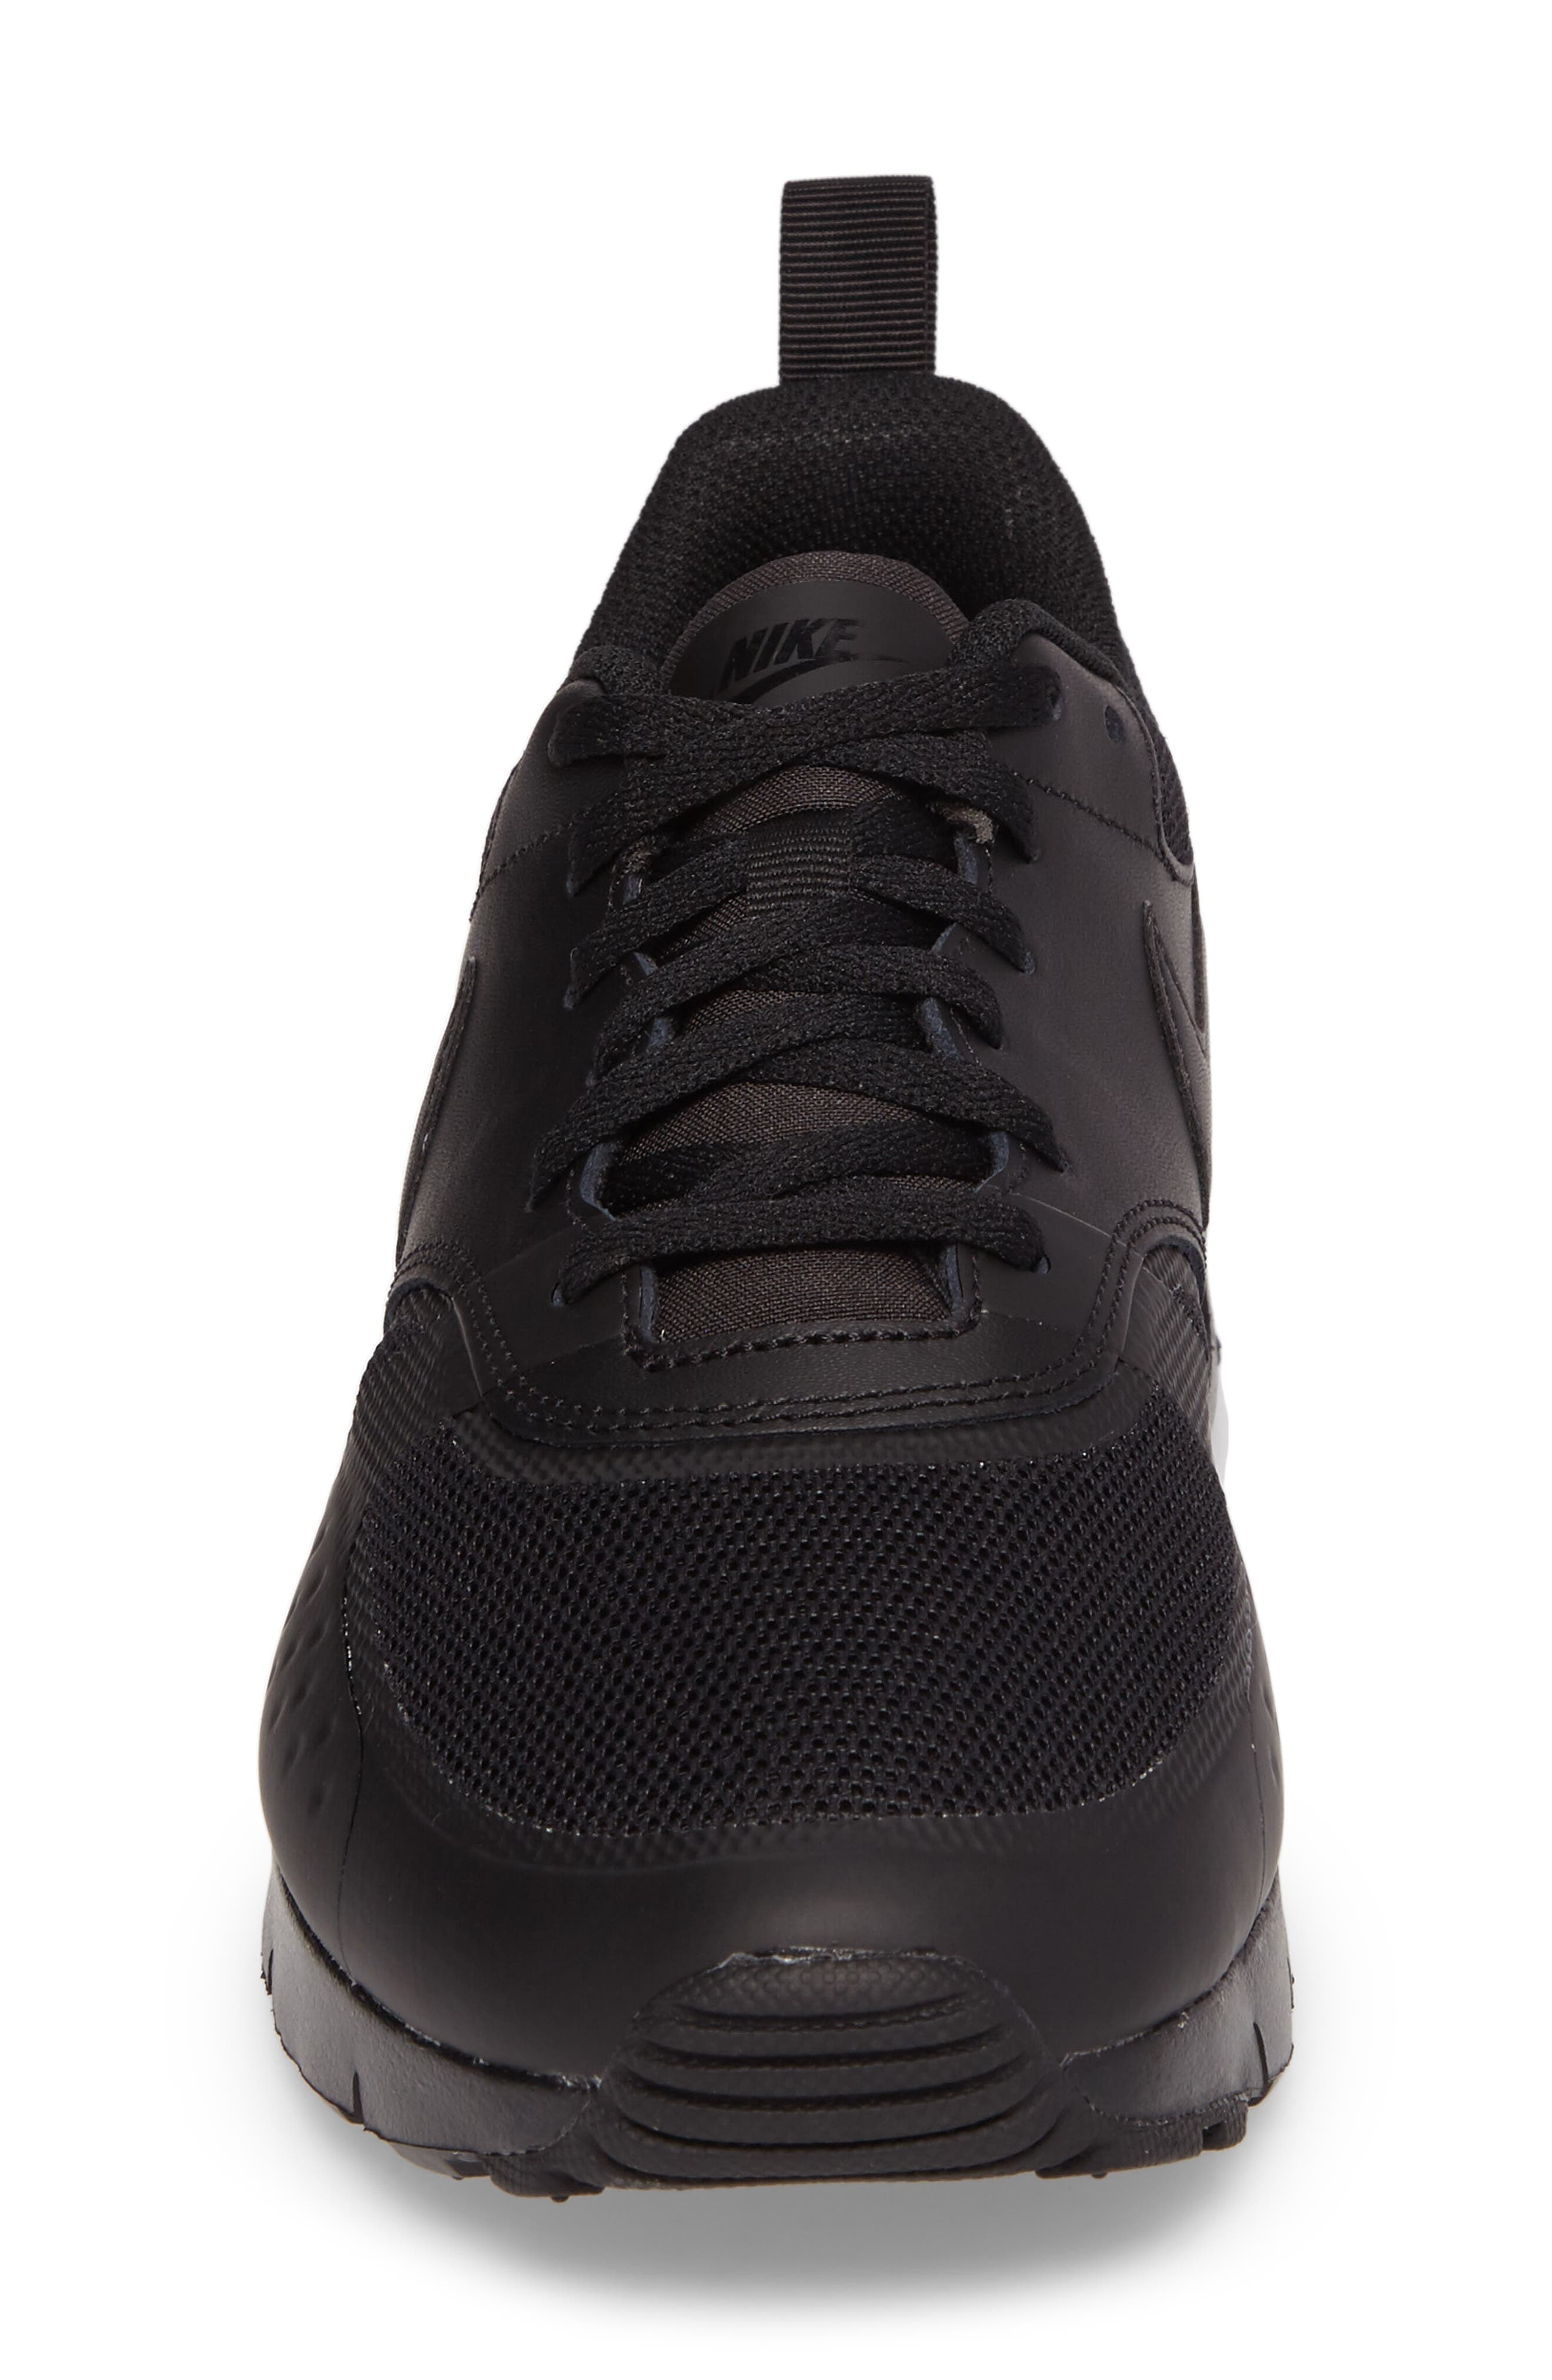 Air Max Vision Sneaker,                             Alternate thumbnail 4, color,                             Black